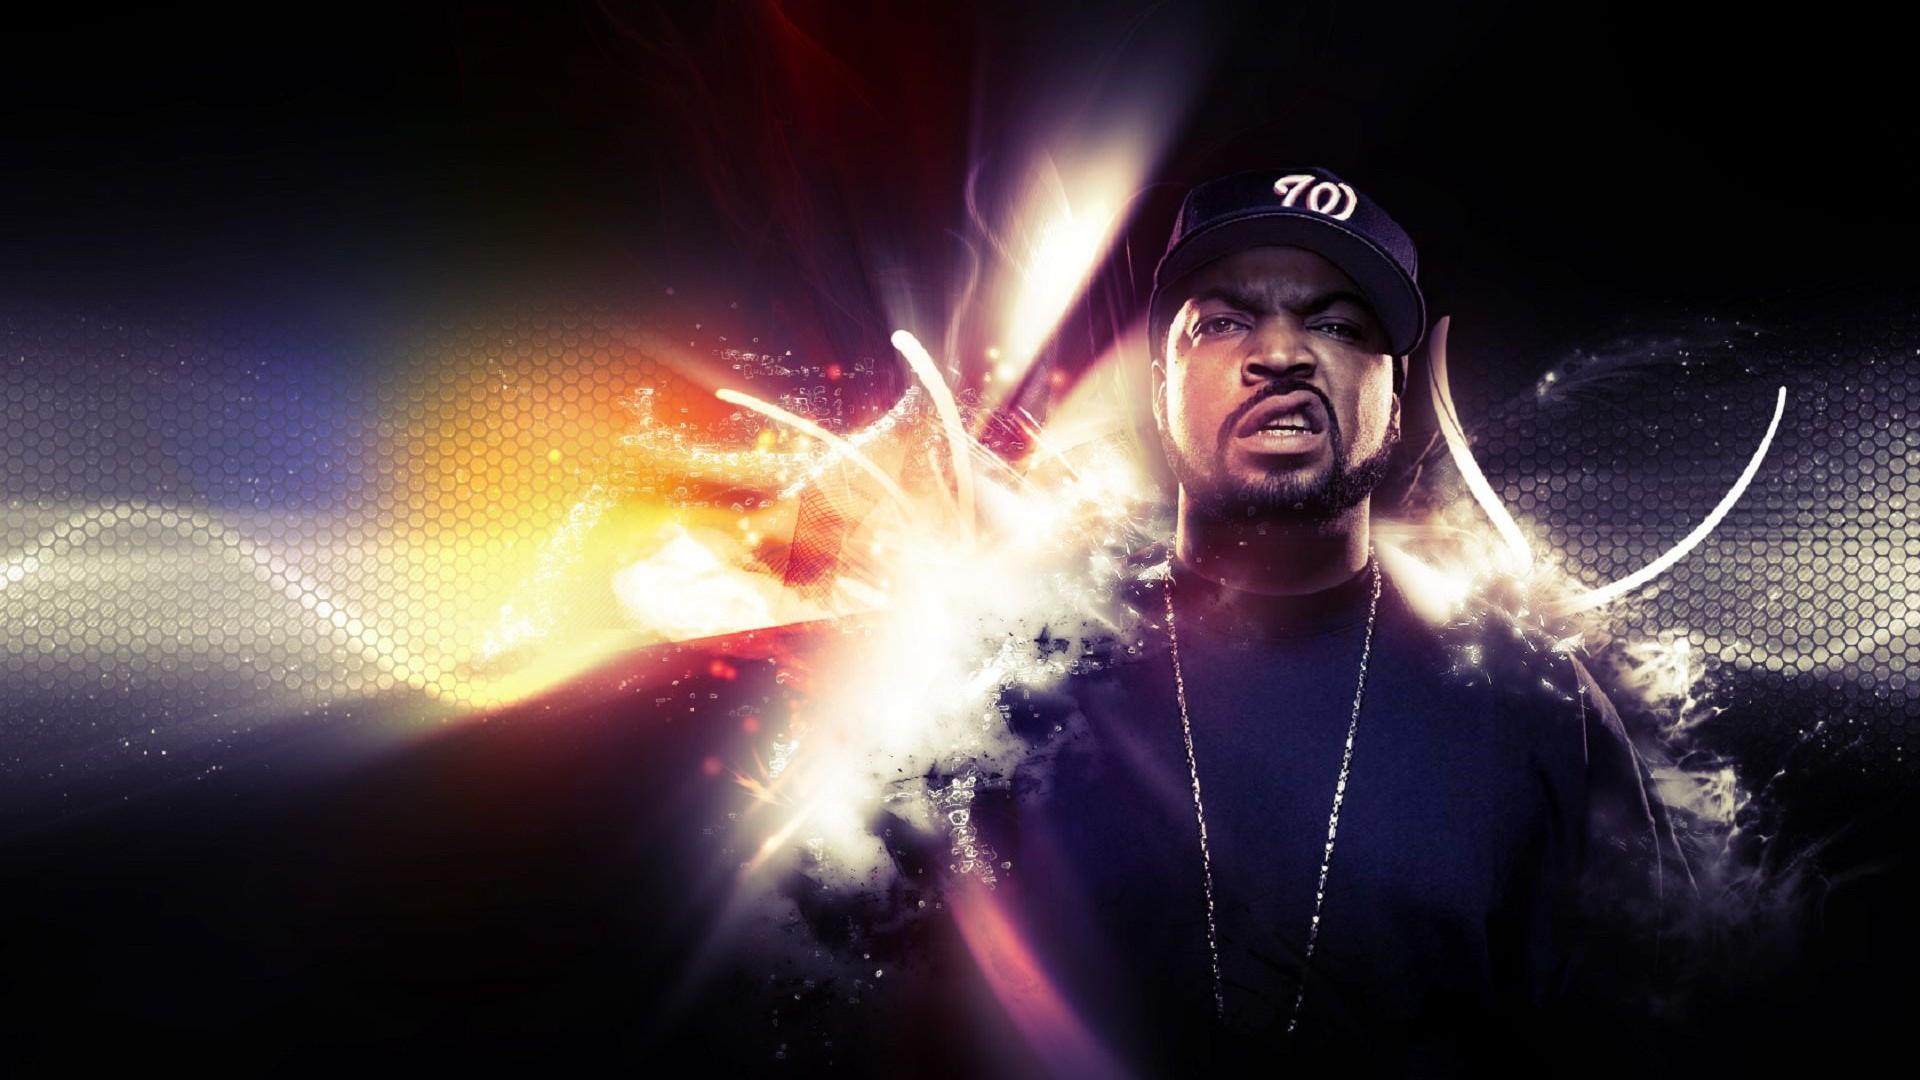 ICE CUBE gangsta rapper rap hip hop e wallpaper 1920x1080 180876 1920x1080